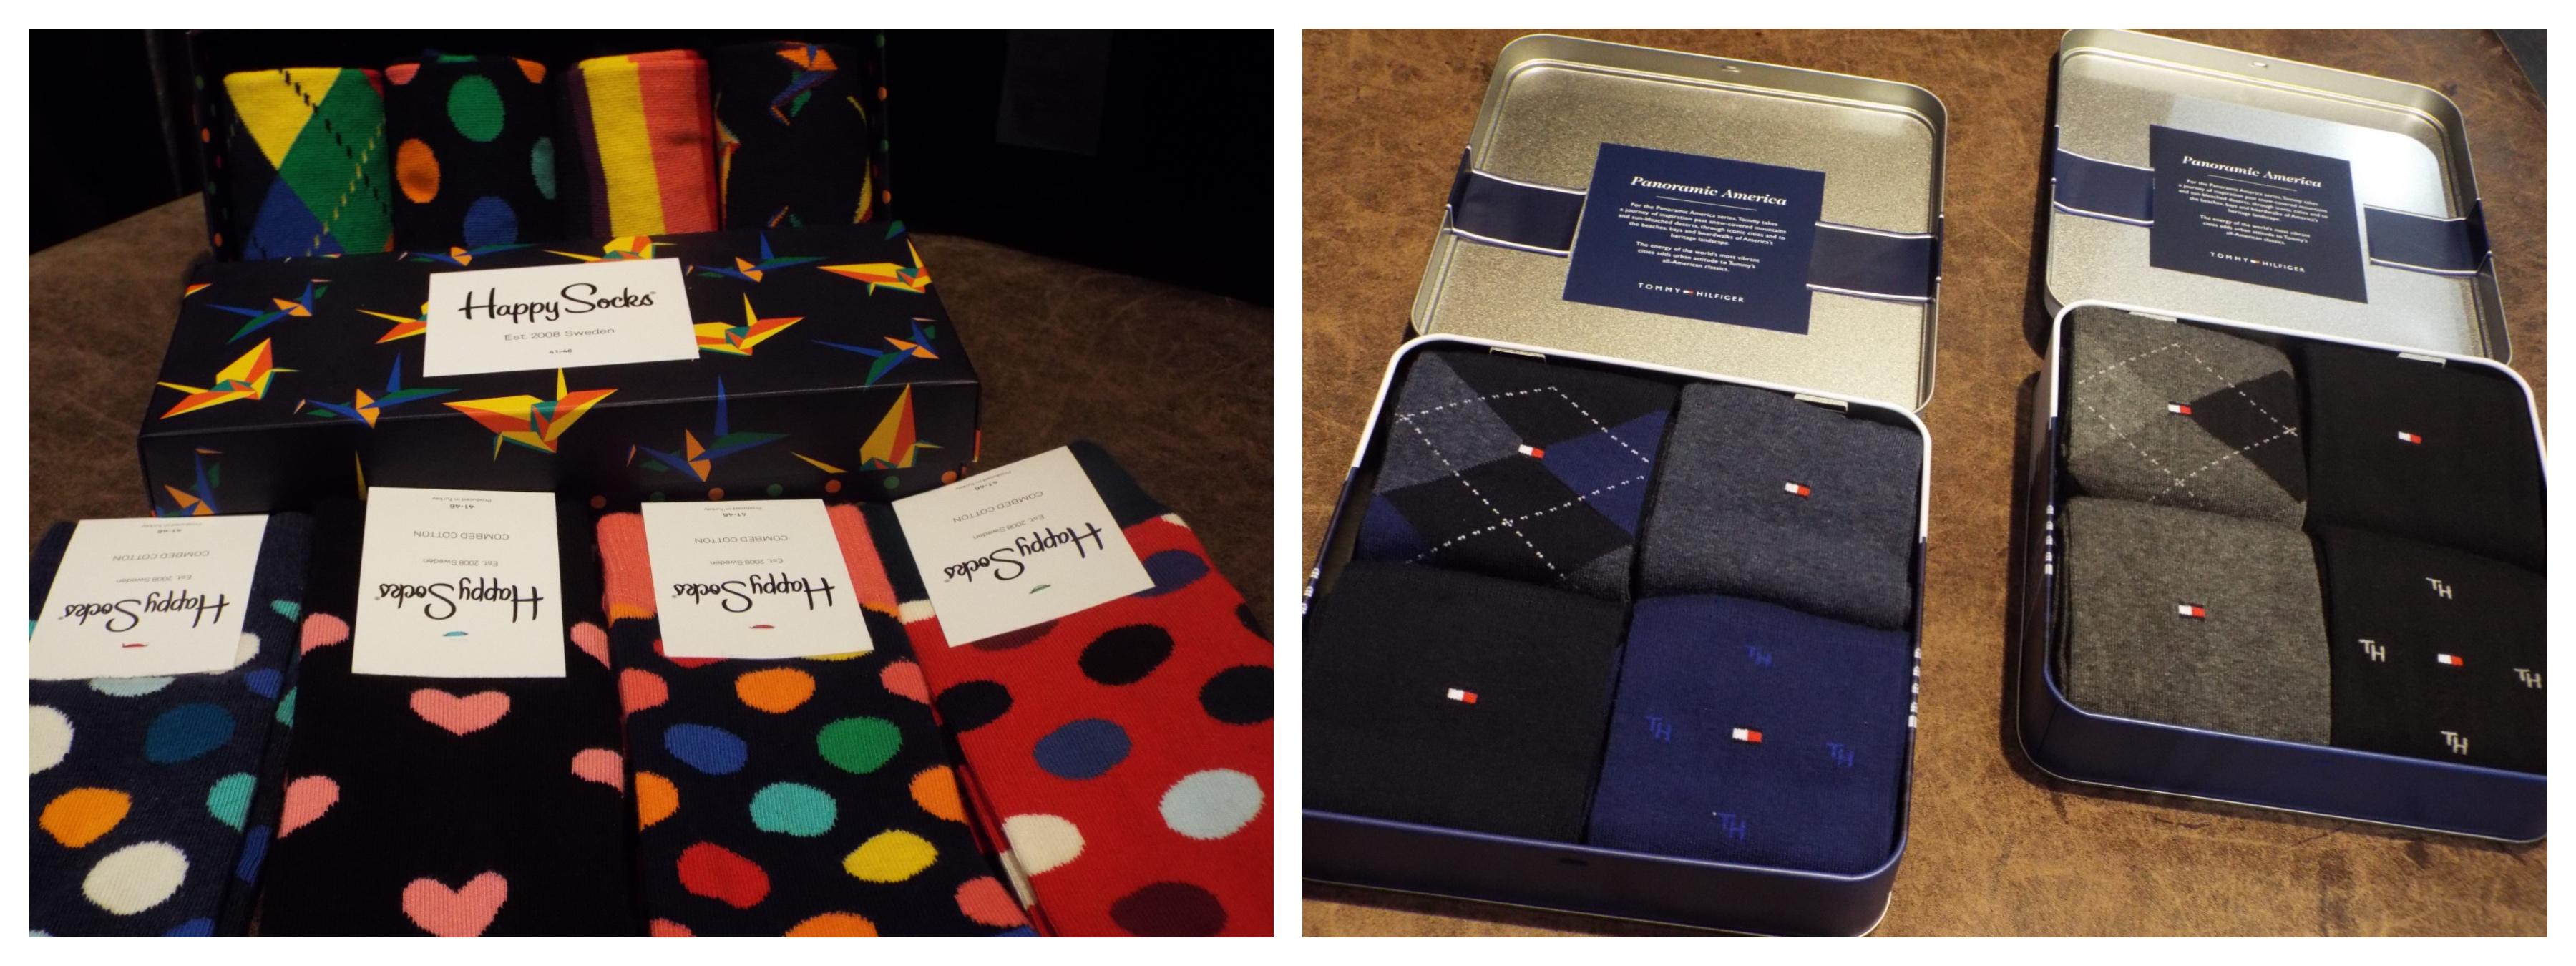 designer menswear christmas gifts for men socks frewen and aylward